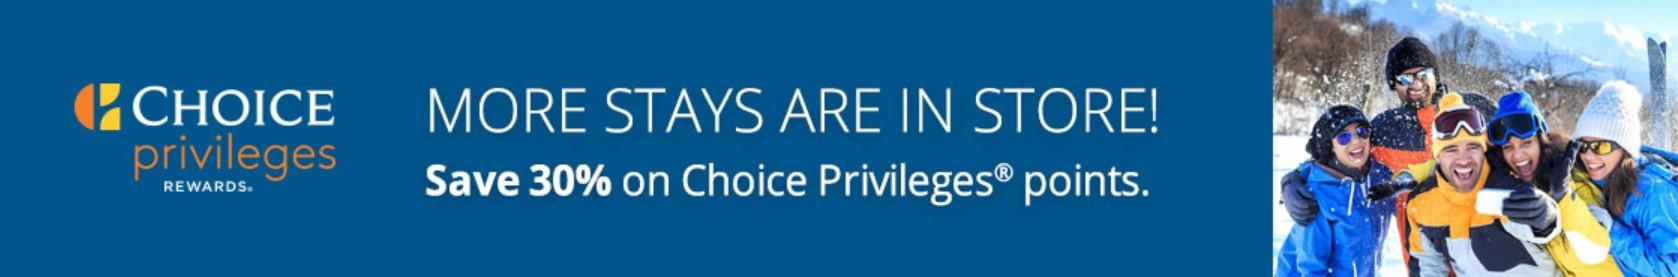 Распродажа баллов Choice Privileges